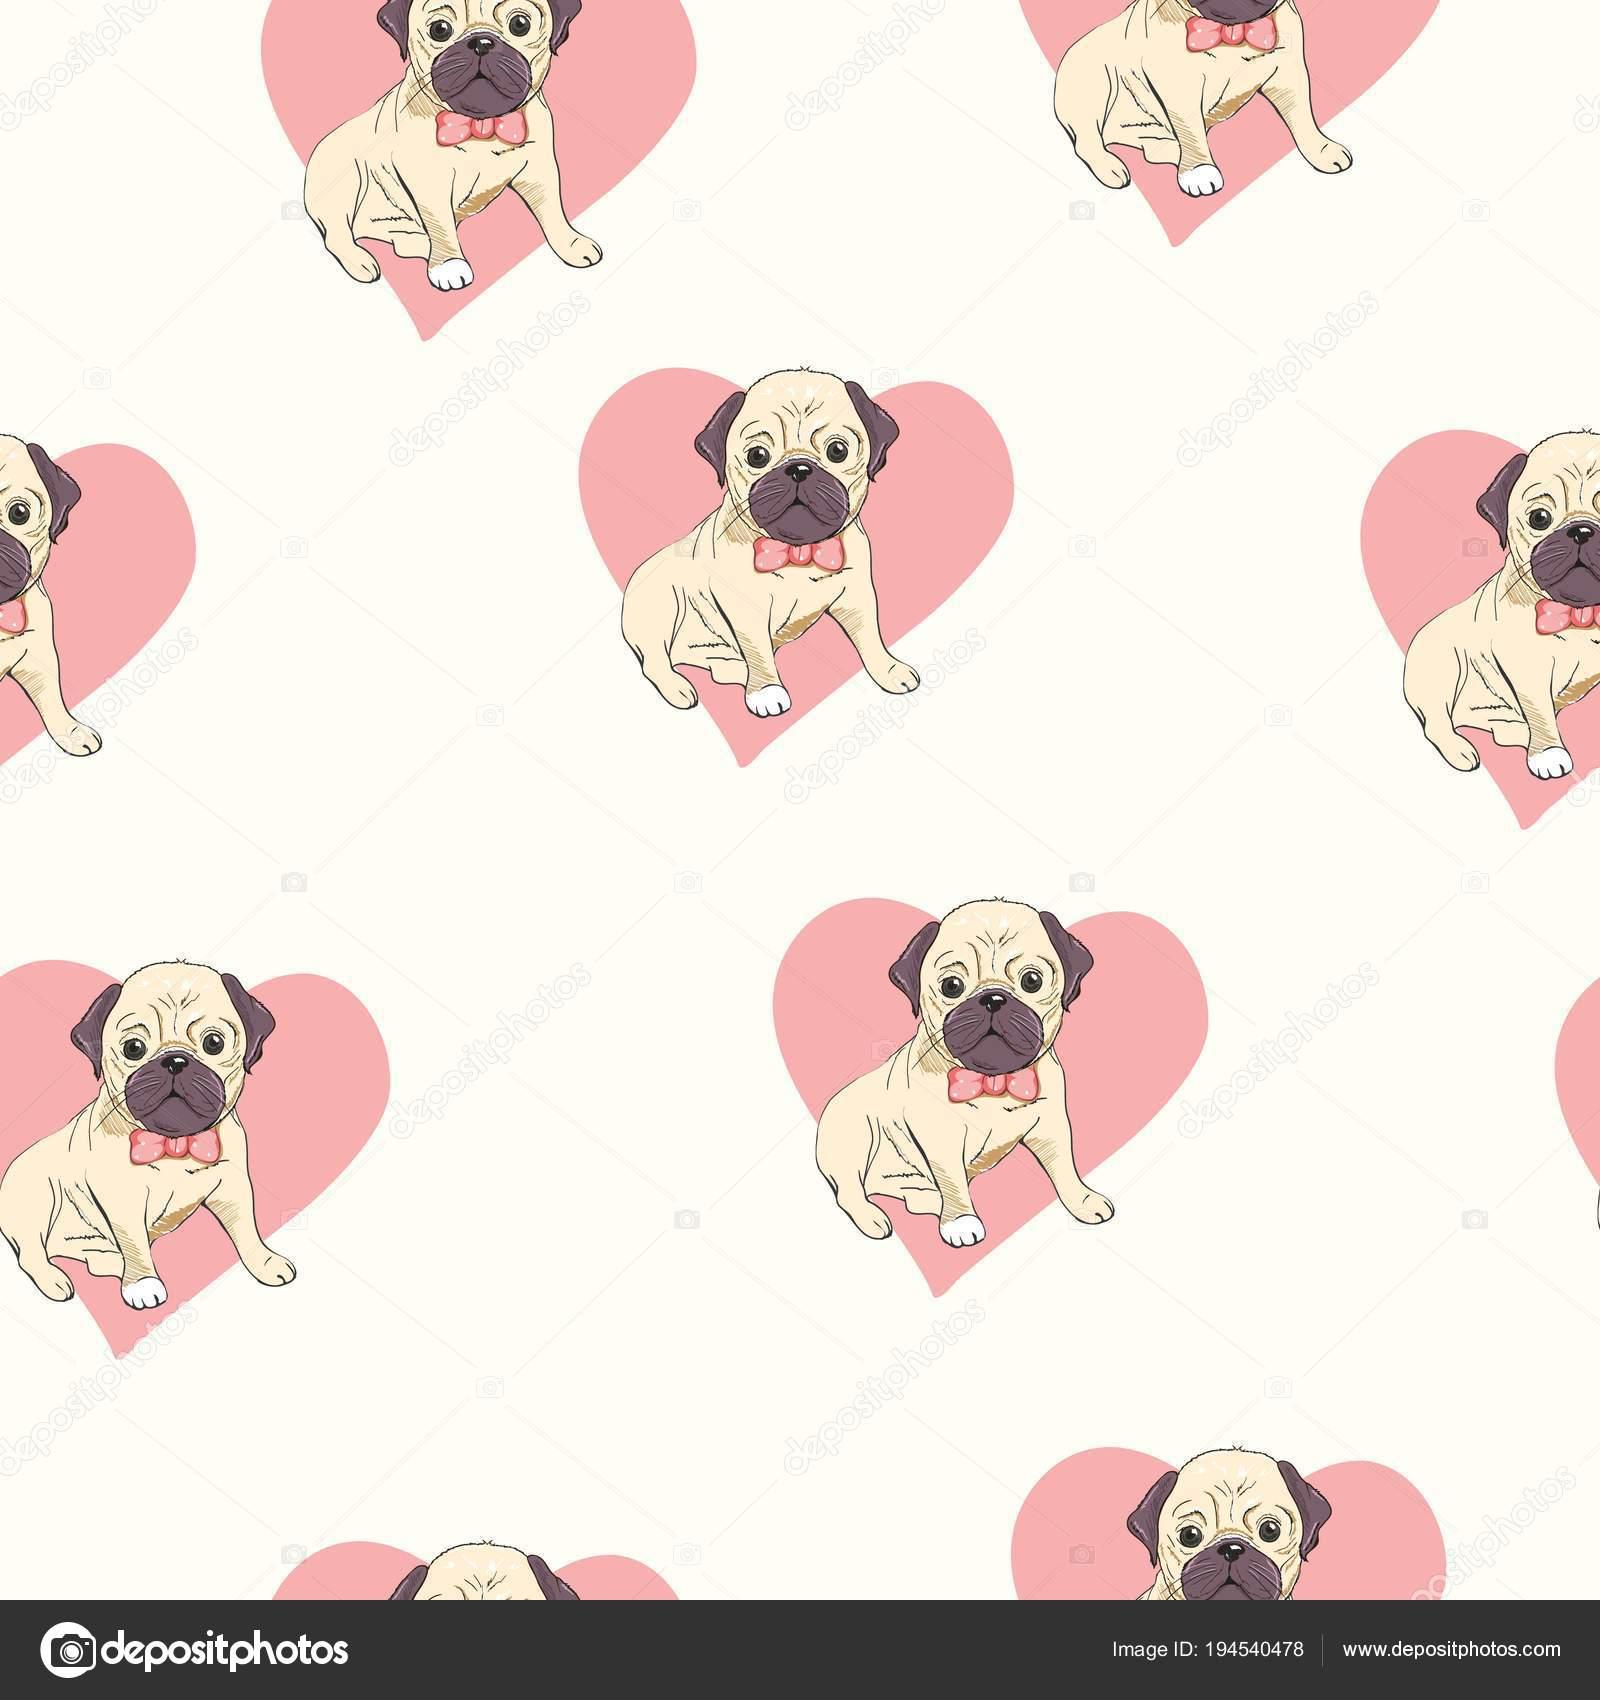 Puppies Cute Wallpaper Cartoon 1600x1700 Wallpaper Teahub Io